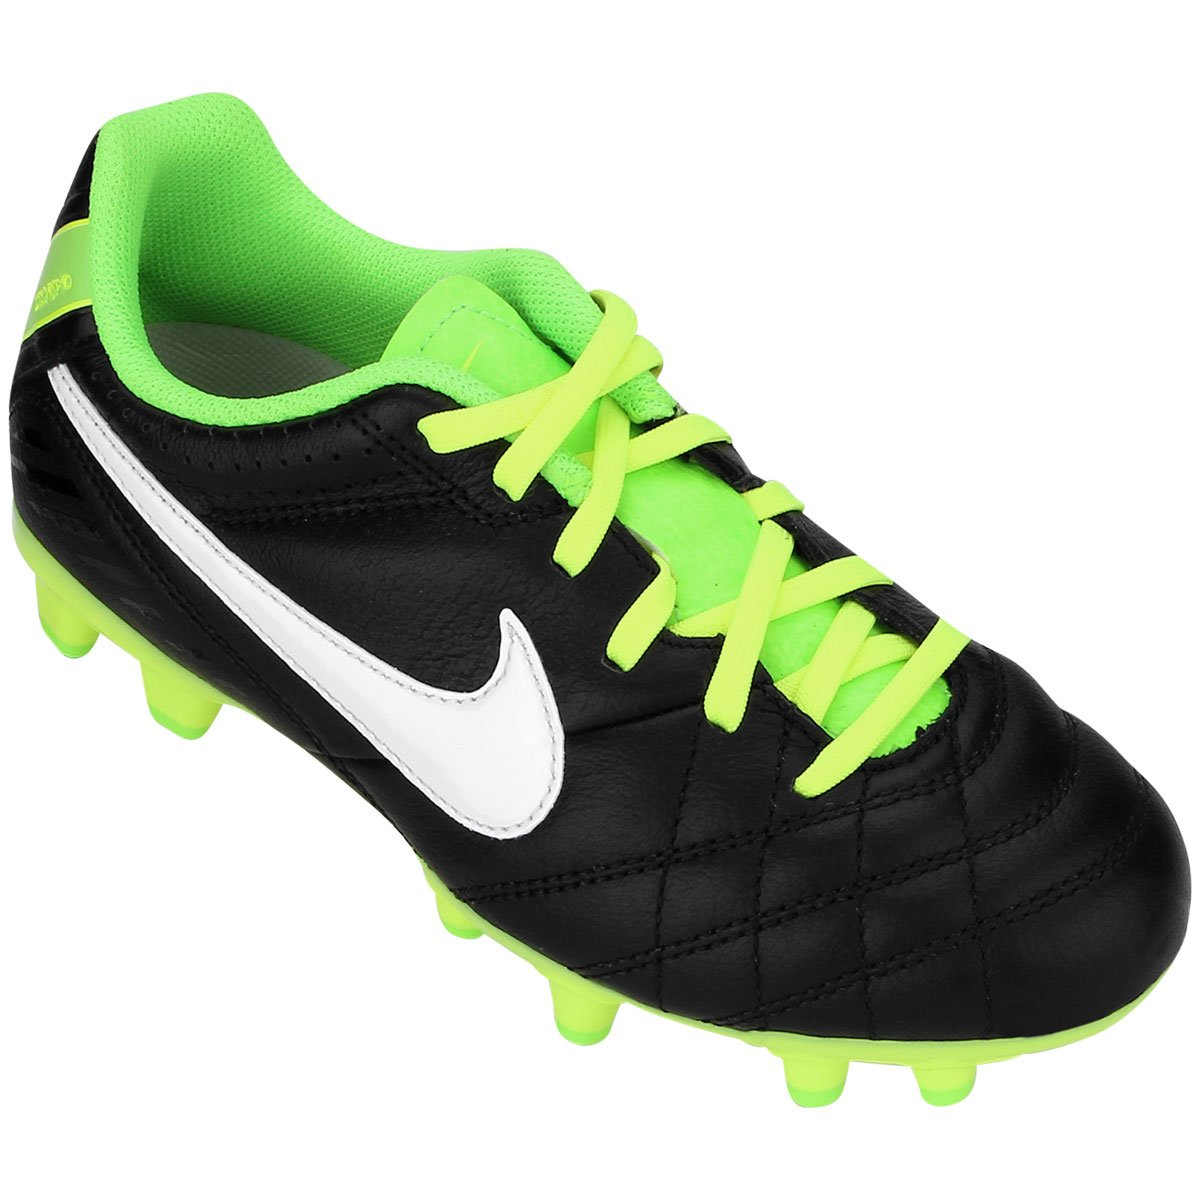 Chuteira Nike Tiempo Natural 4 FG Leather Infantil - Compre Agora ... b956f321bd7f4